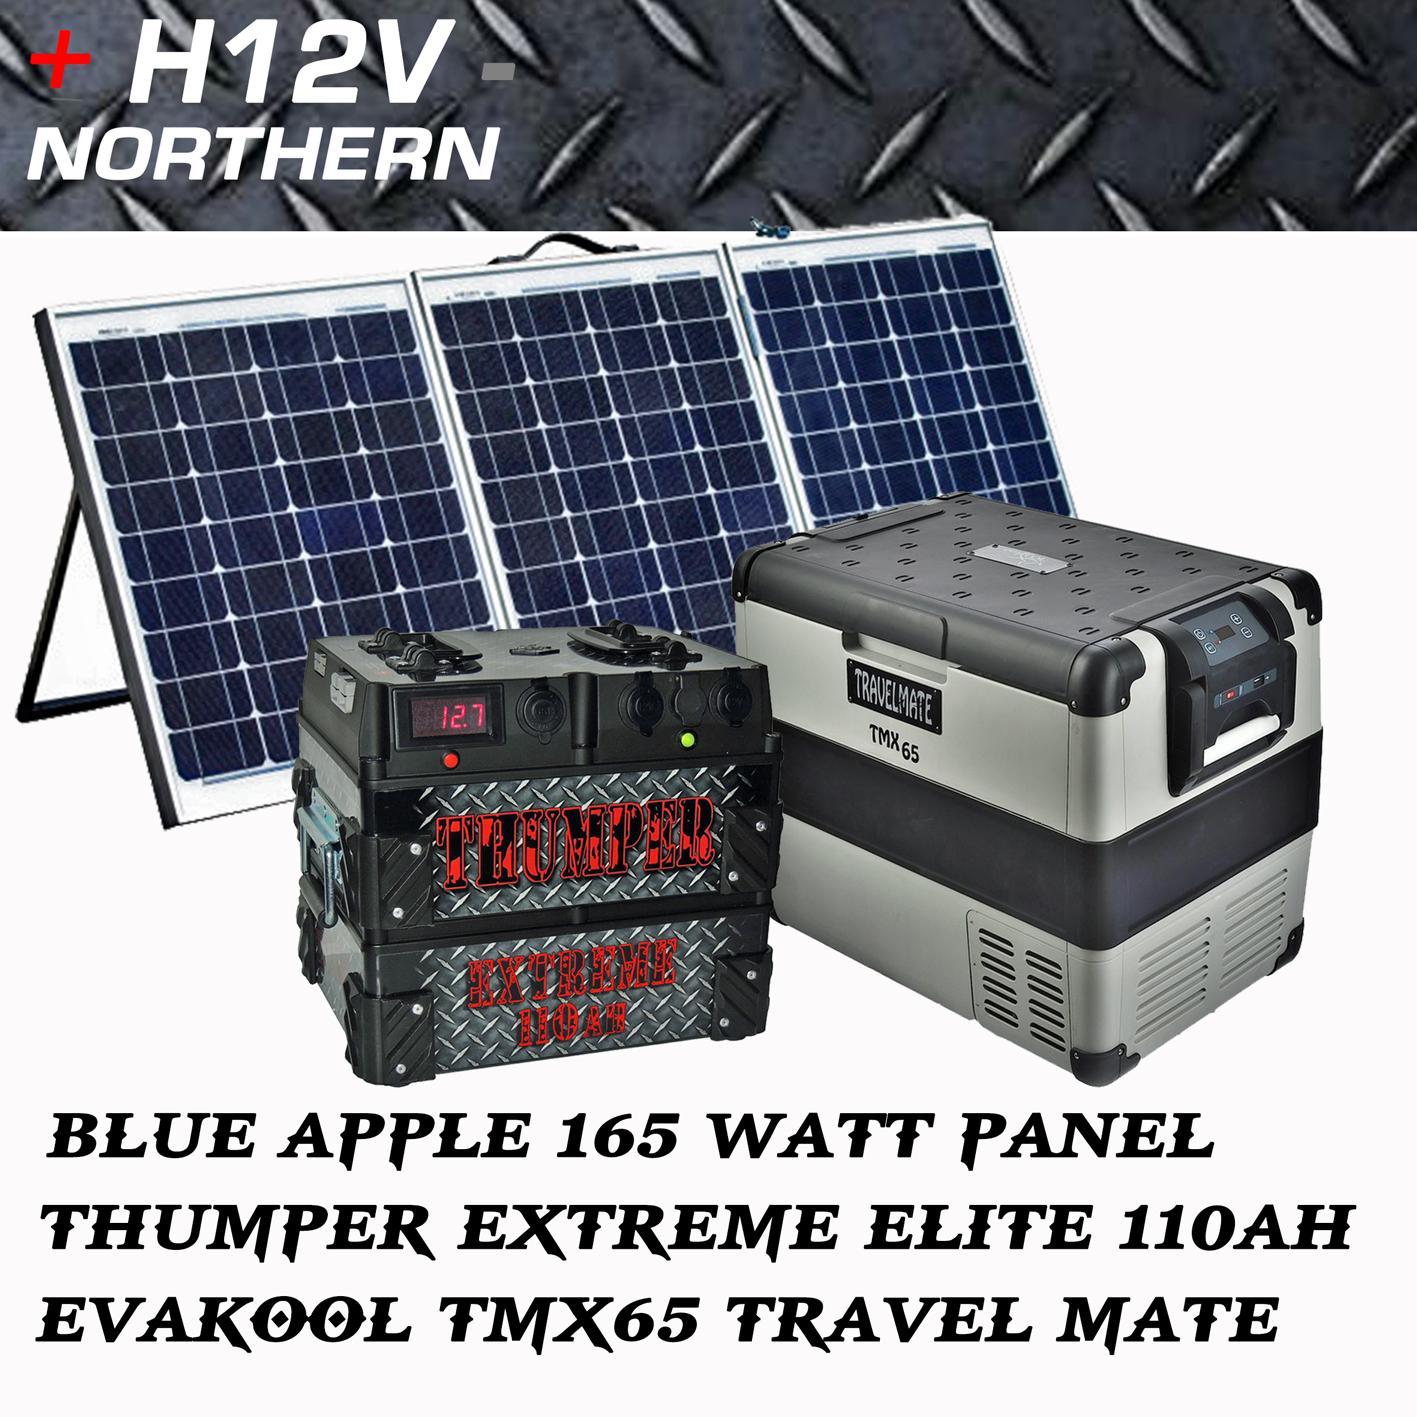 Ba 165 Watt Tri Fold Panel Thumper 110ah Elite Evakool